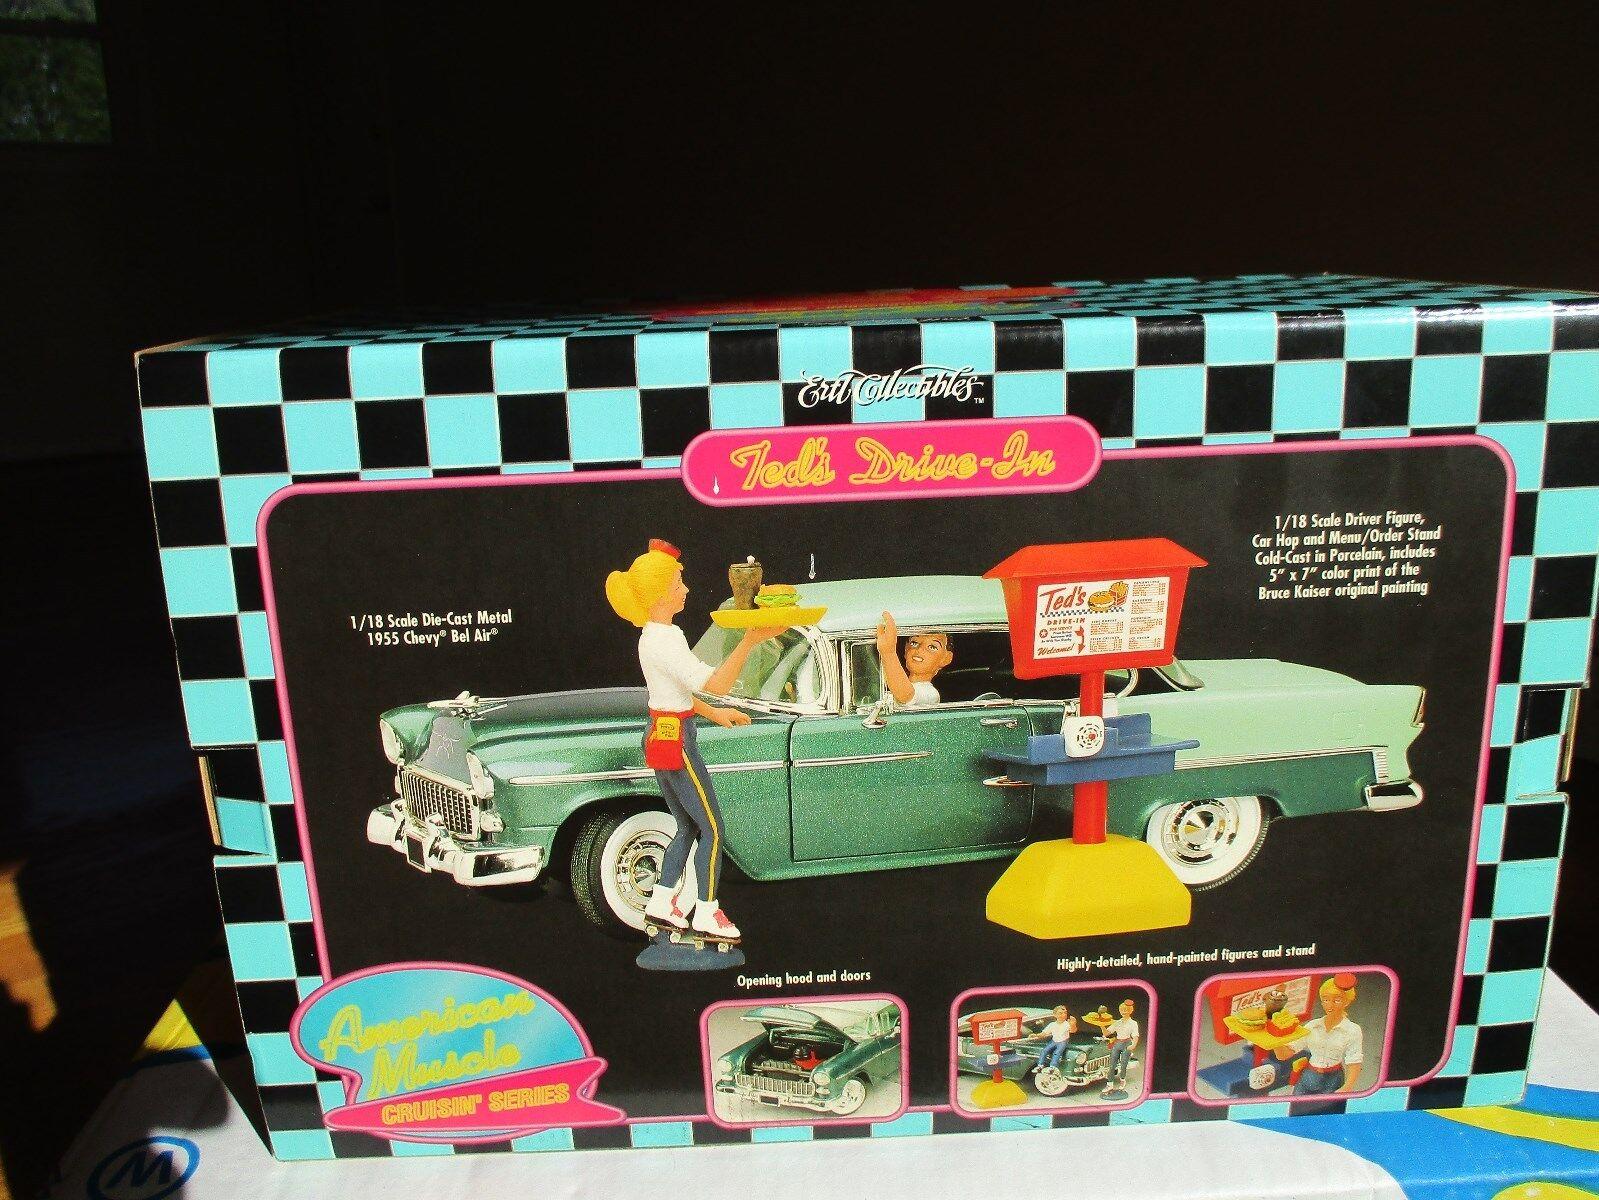 1 18 Die Cast & Porcelana Ertl Diorama  Ted's Drive-in  Menta En Caja Difícil de encontrar